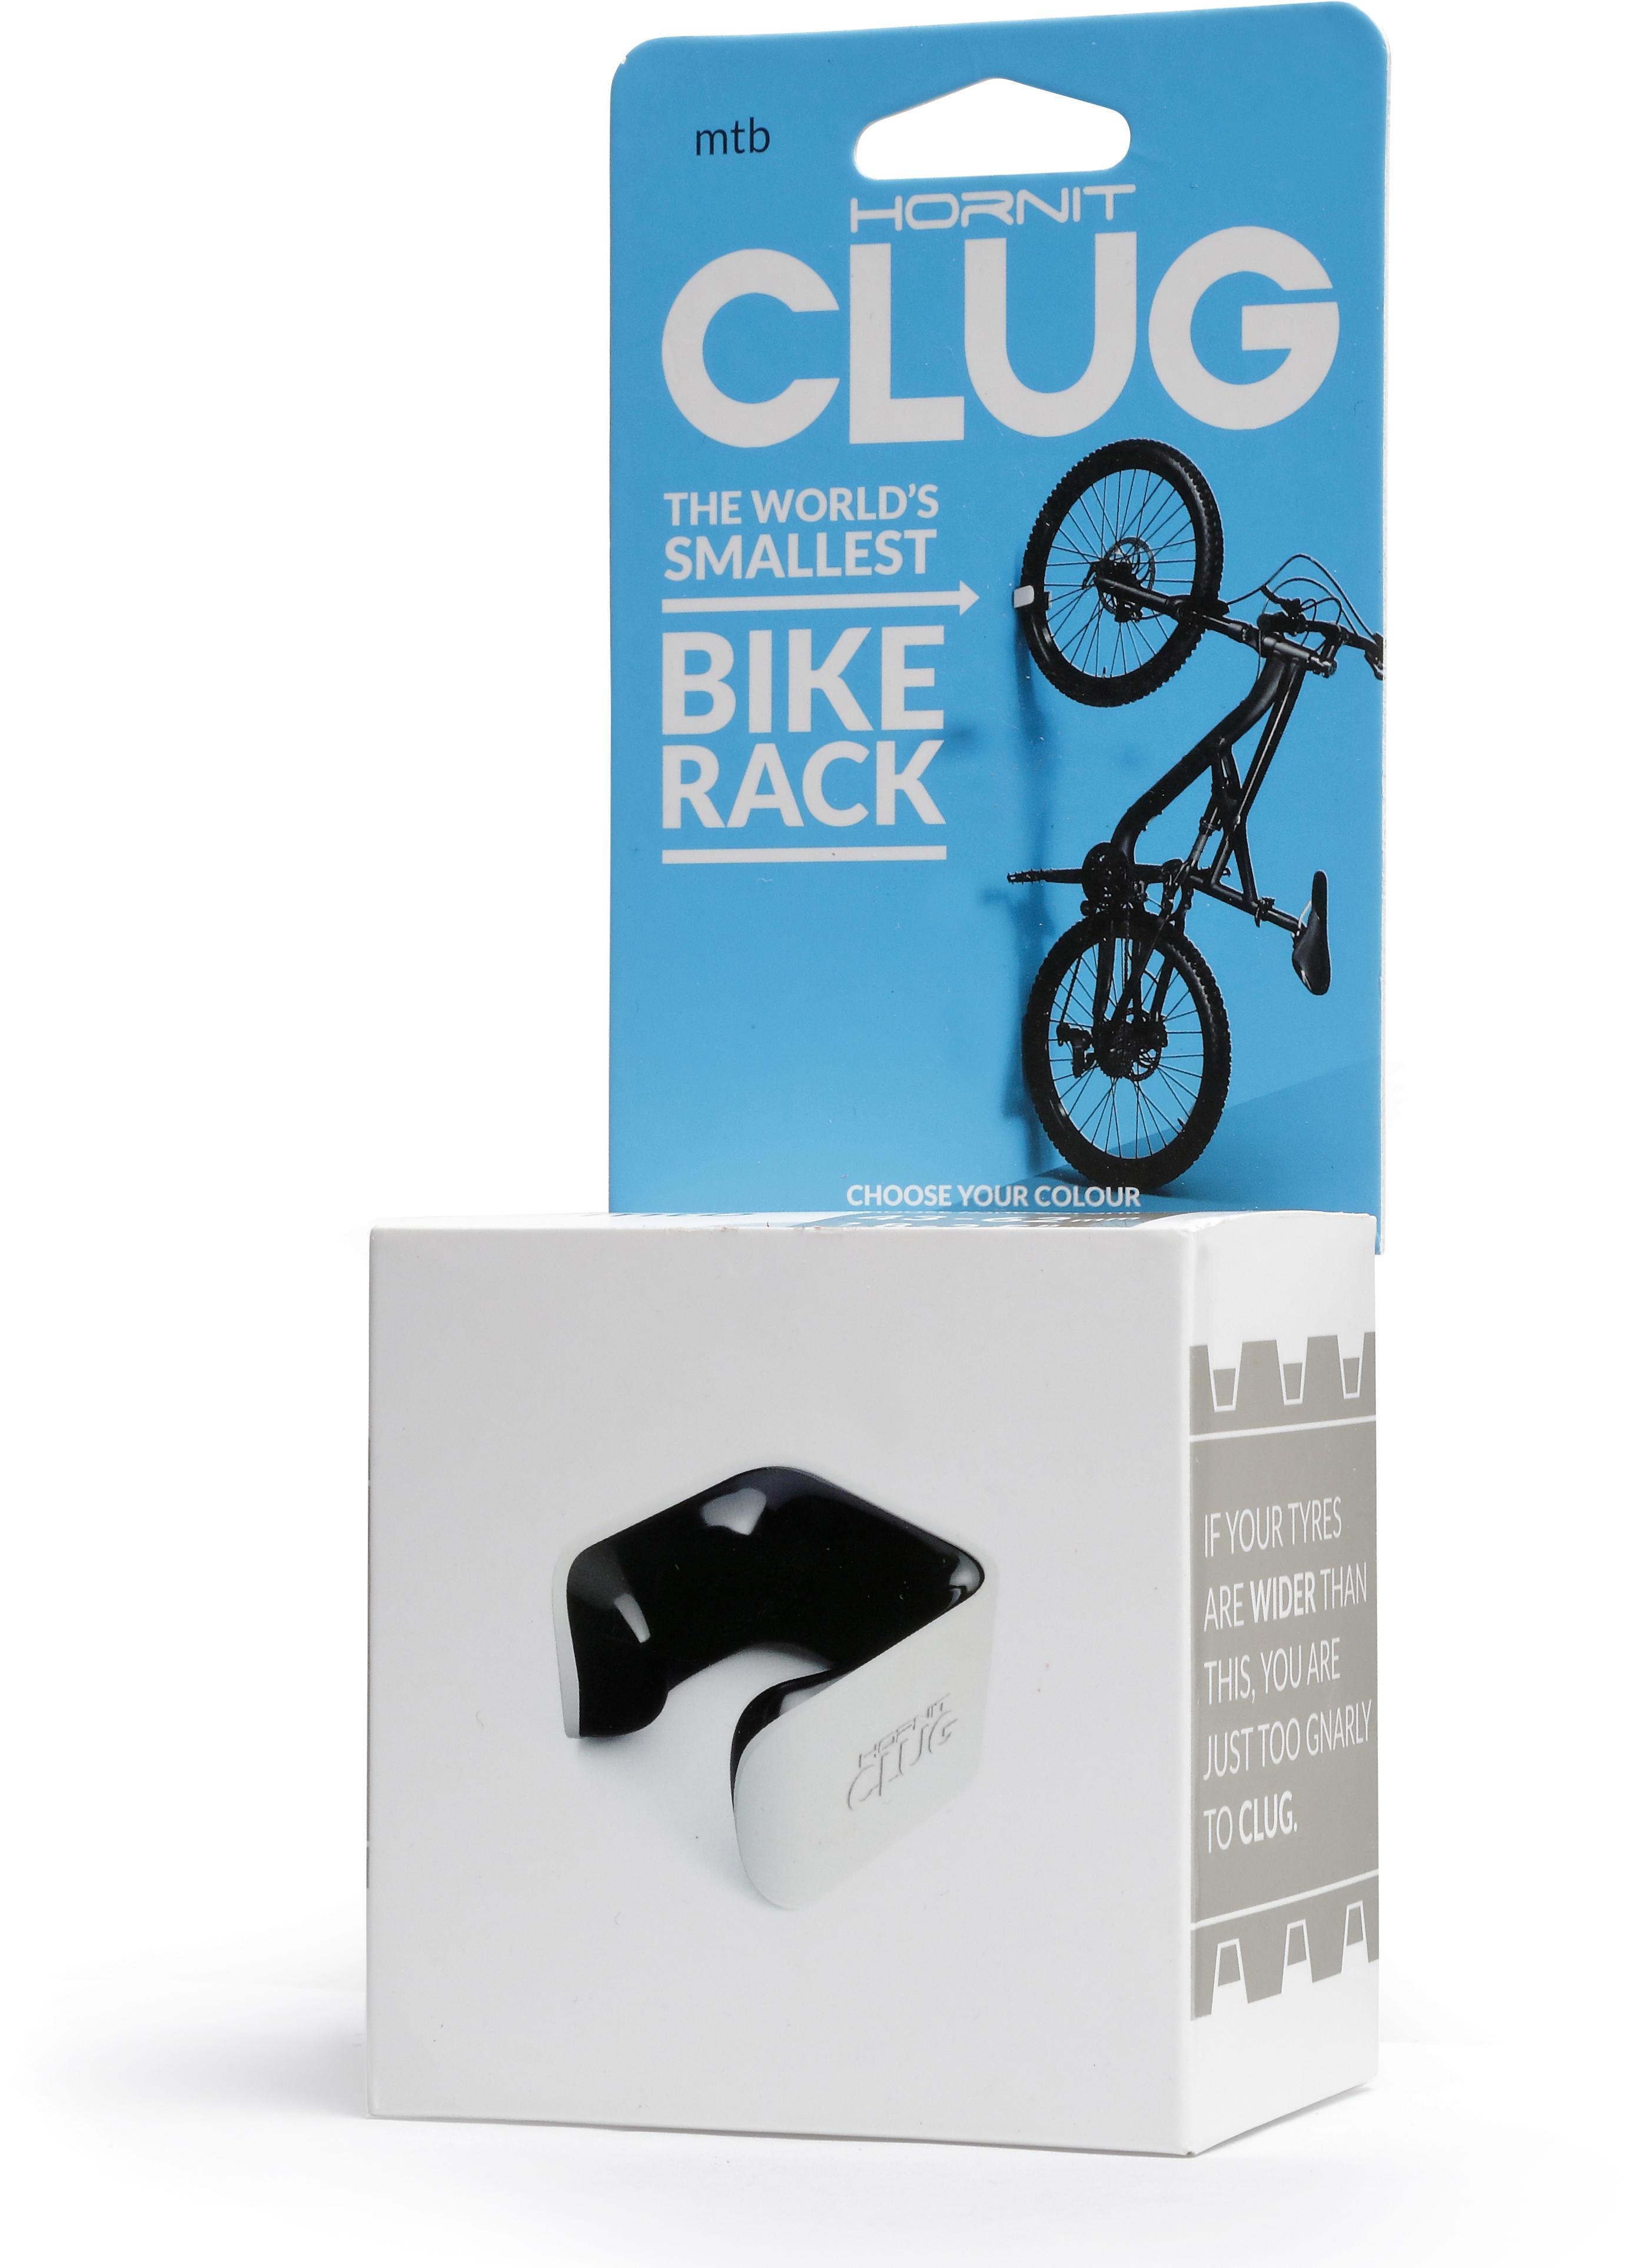 Hornit clug MTB Worlds Smallest Bike Rack